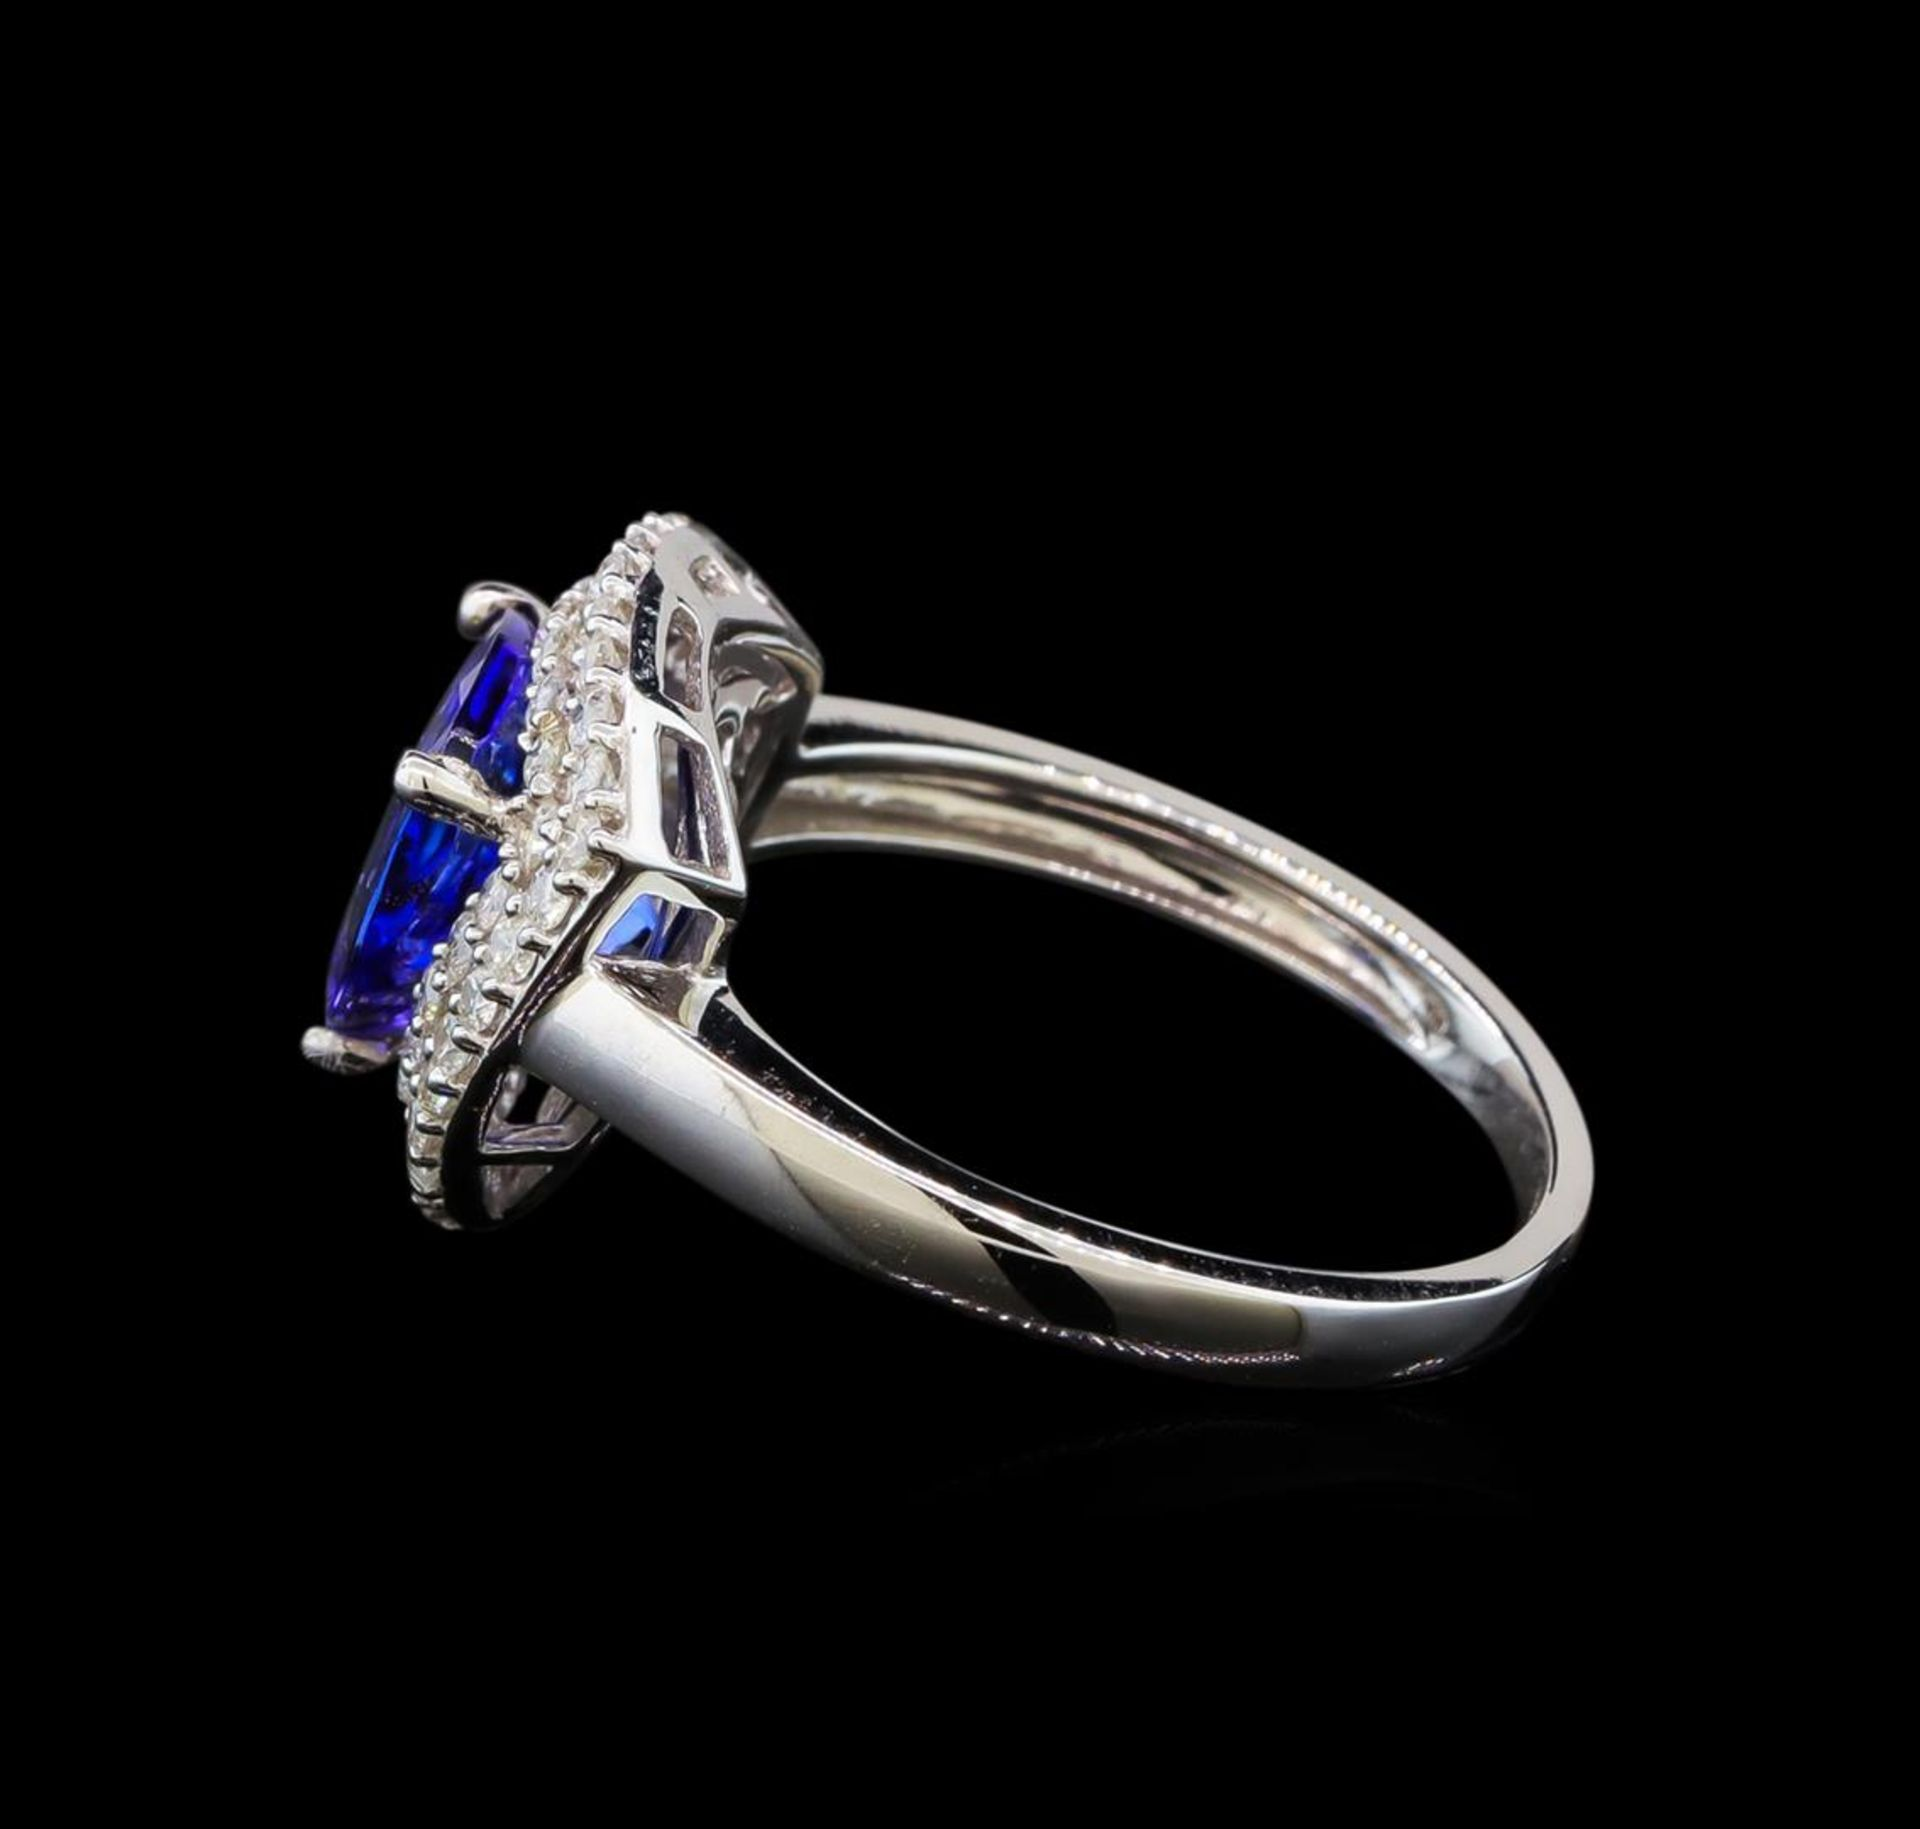 14KT White Gold 2.09 ctw Tanzanite and Diamond Ring - Image 3 of 5